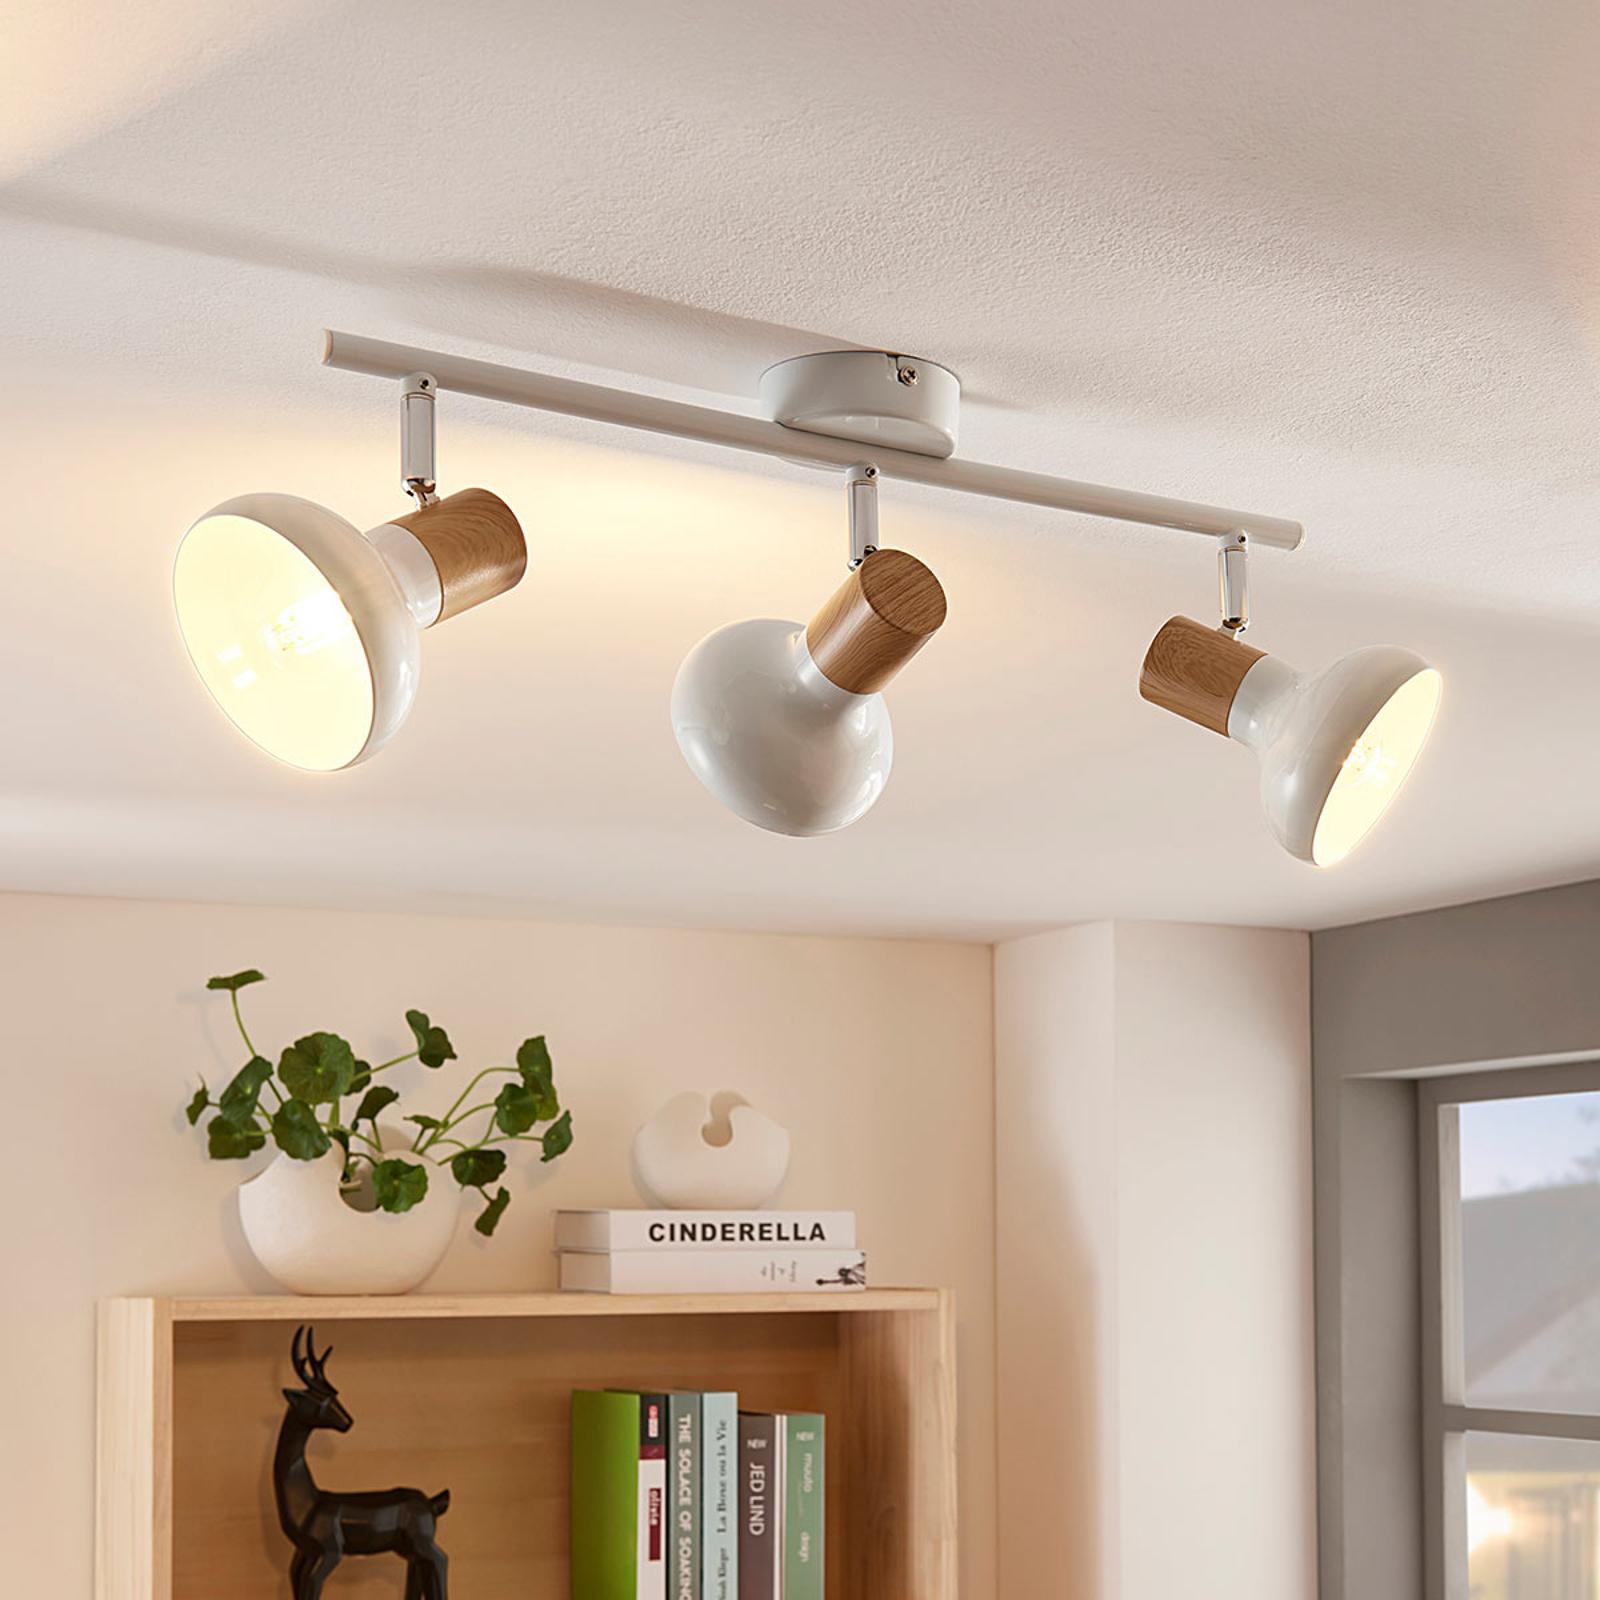 Fridolin - metalen plafondlamp met 3 lampen